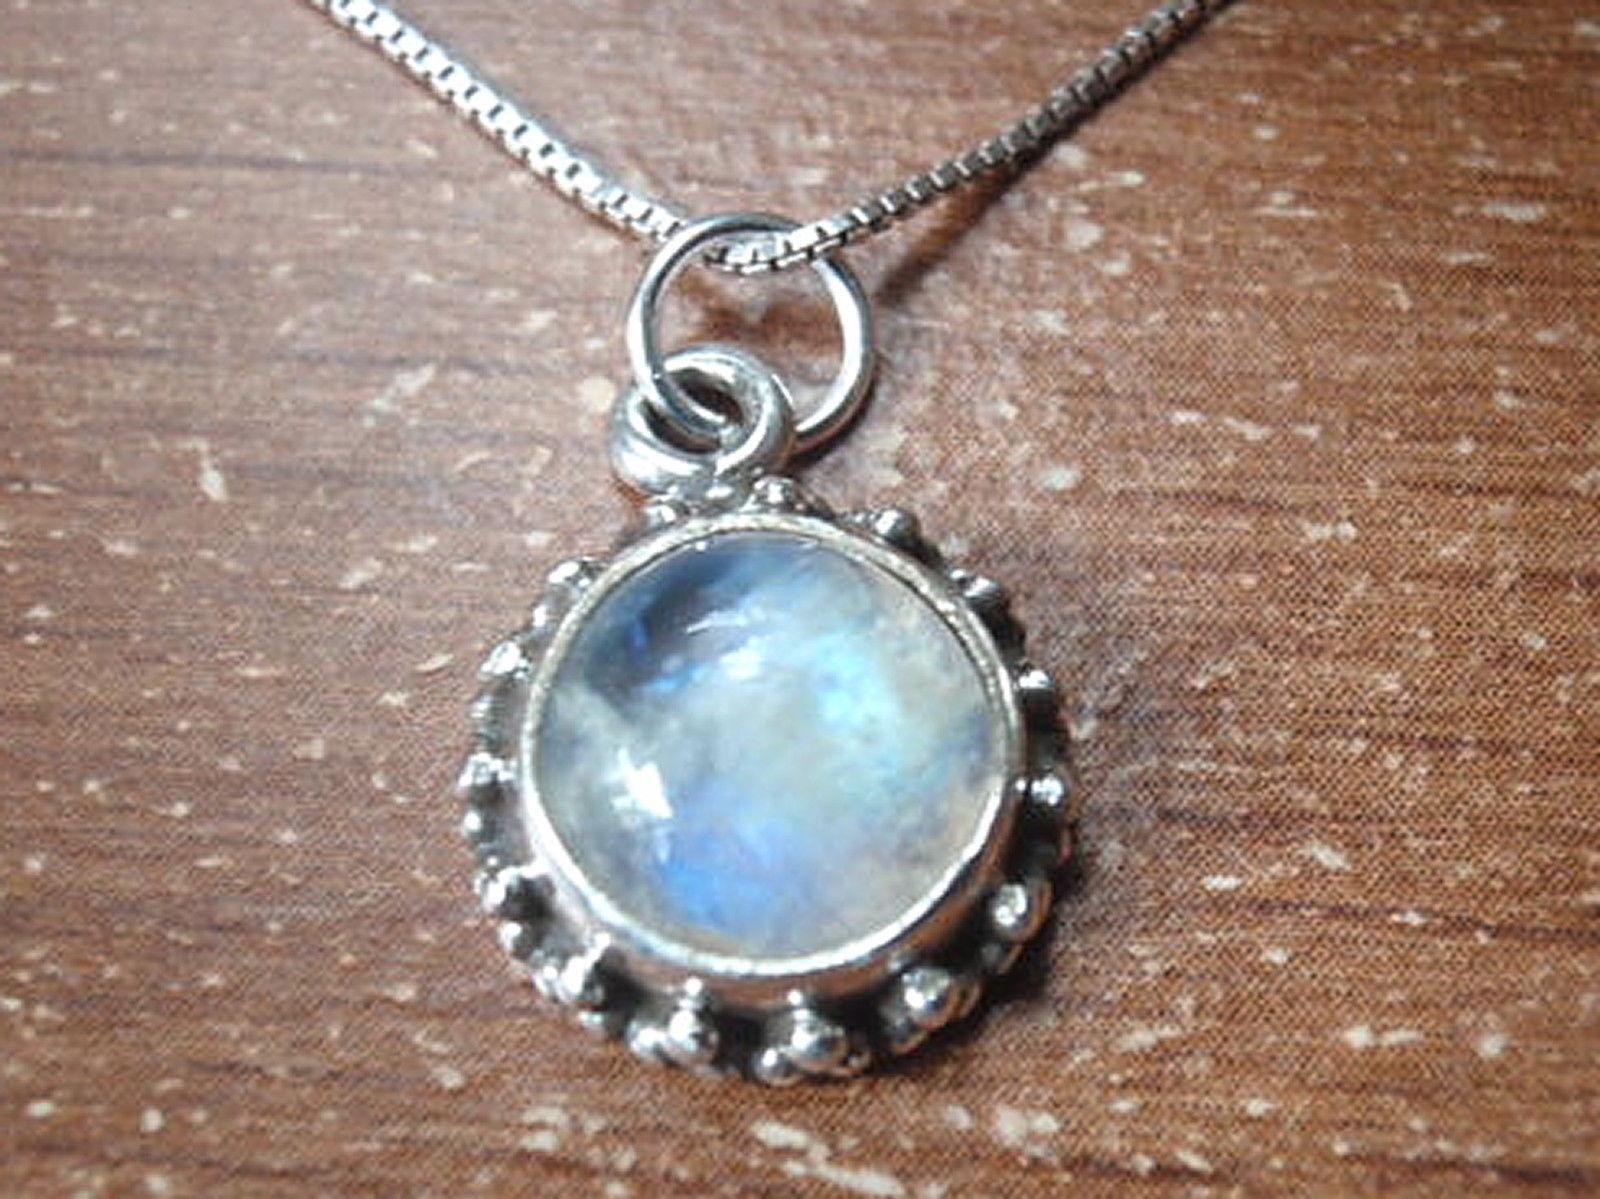 Round Lapis Lazuli 925 Sterling Silver Pendant Corona Sun Jewelry